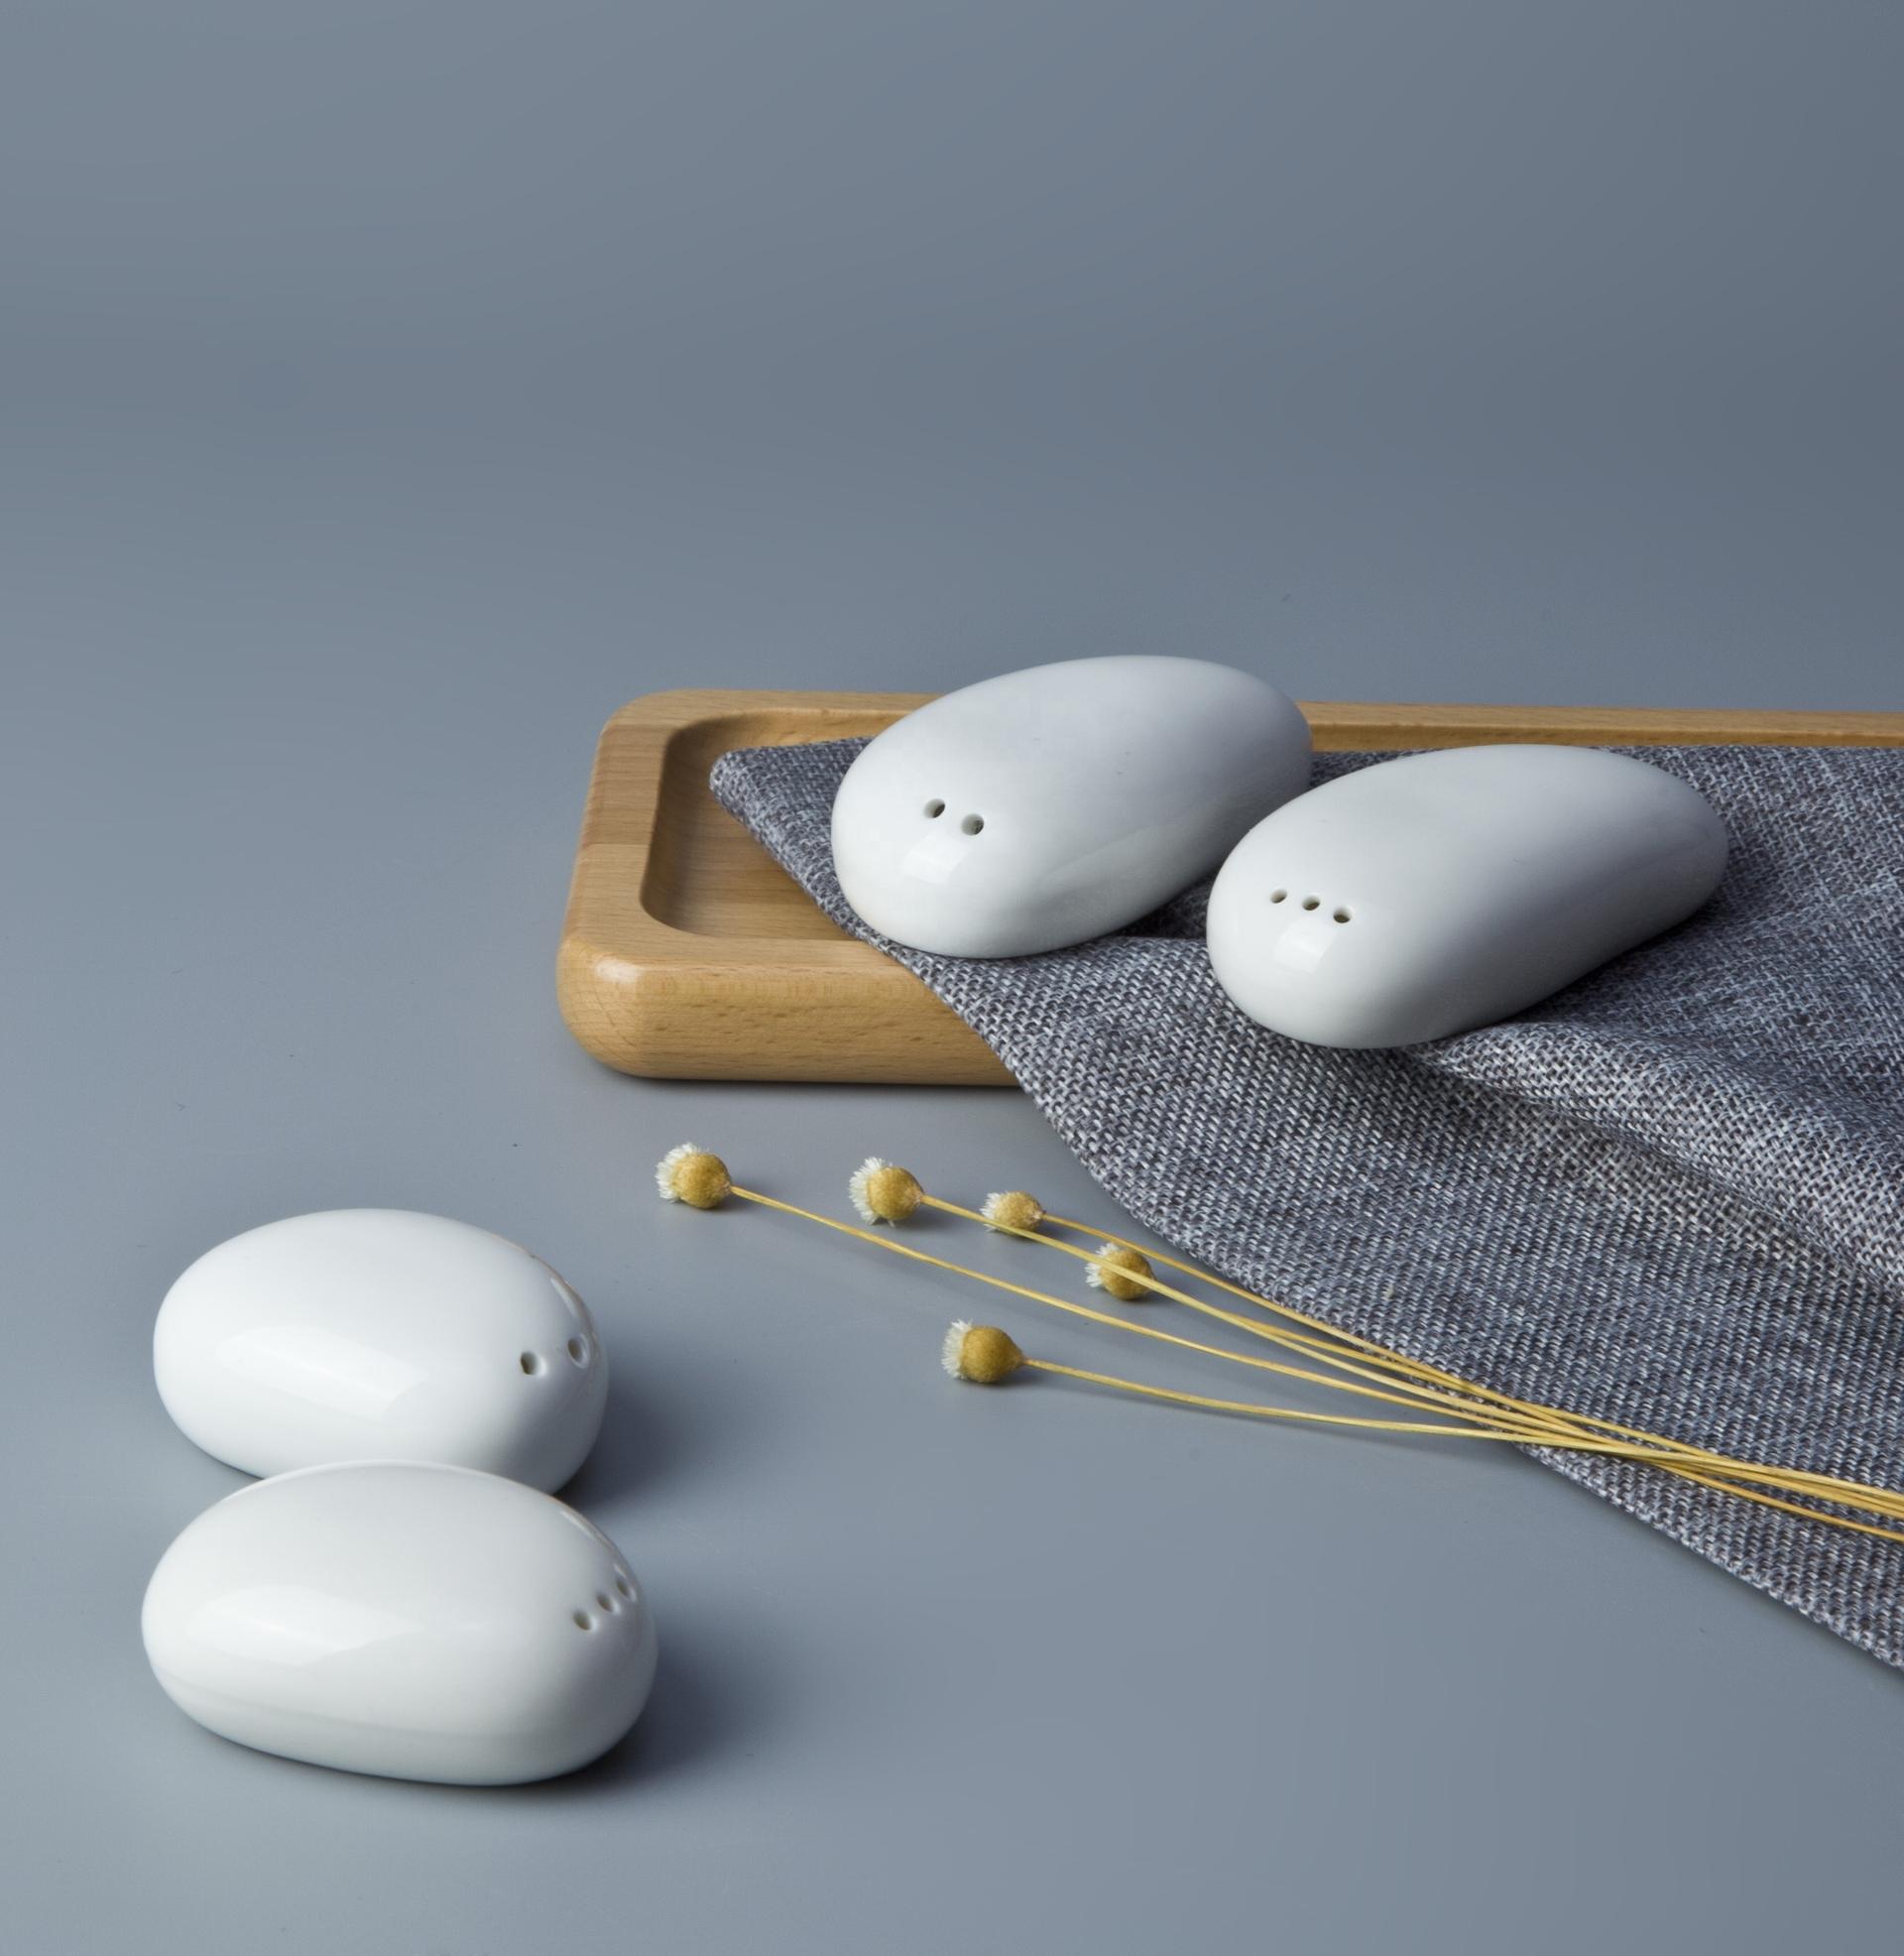 Wholesale Crockery Tableware Egg Shaped Salt And Pepper Shaker, Salt And Pepper Shakers For Banquet&